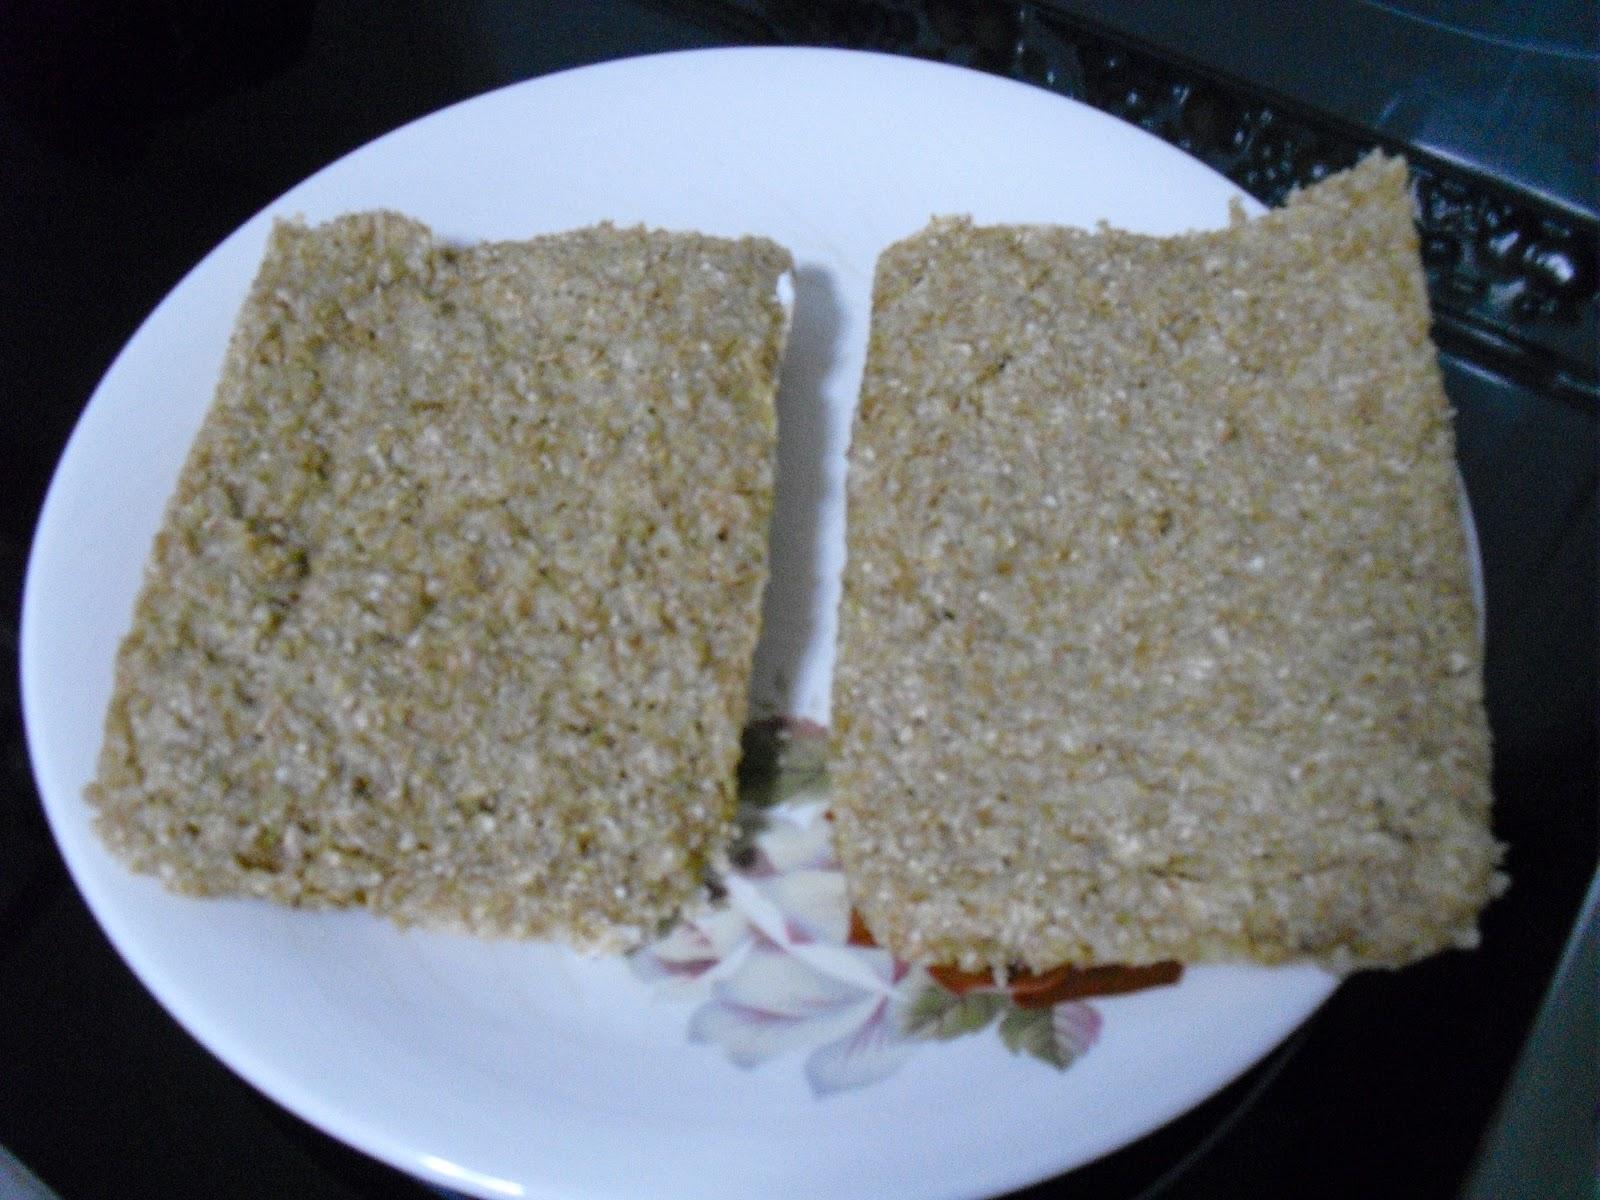 hacer pan dukan en el microondas